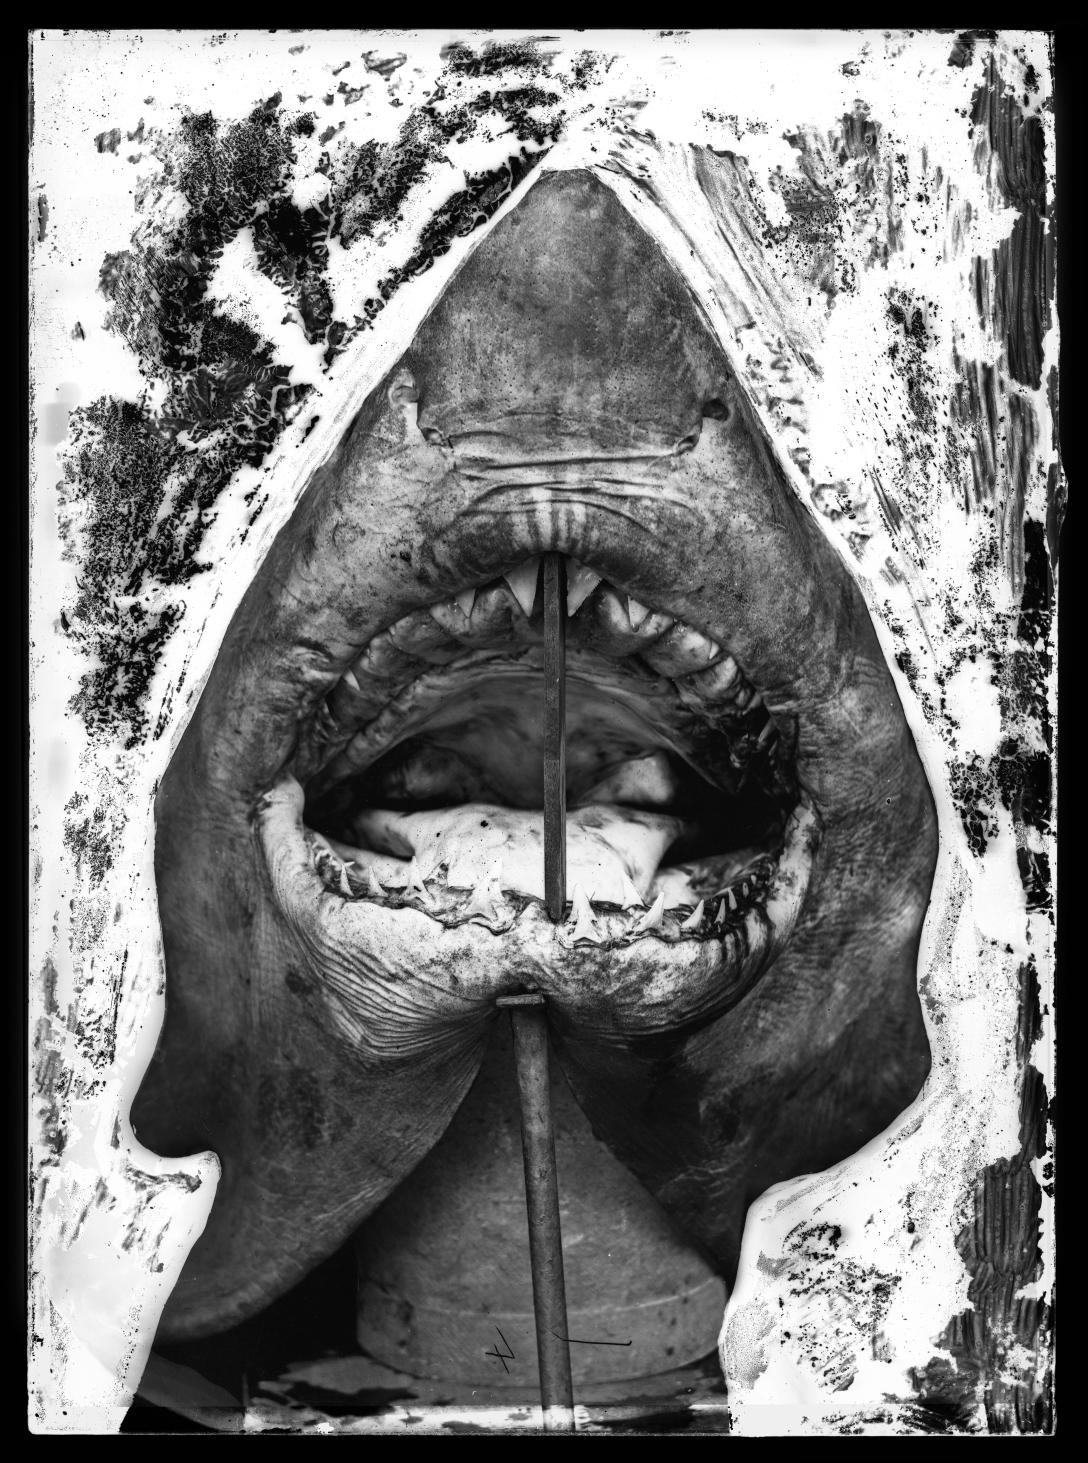 Capturing Nature Australian Museum Archival Photographs